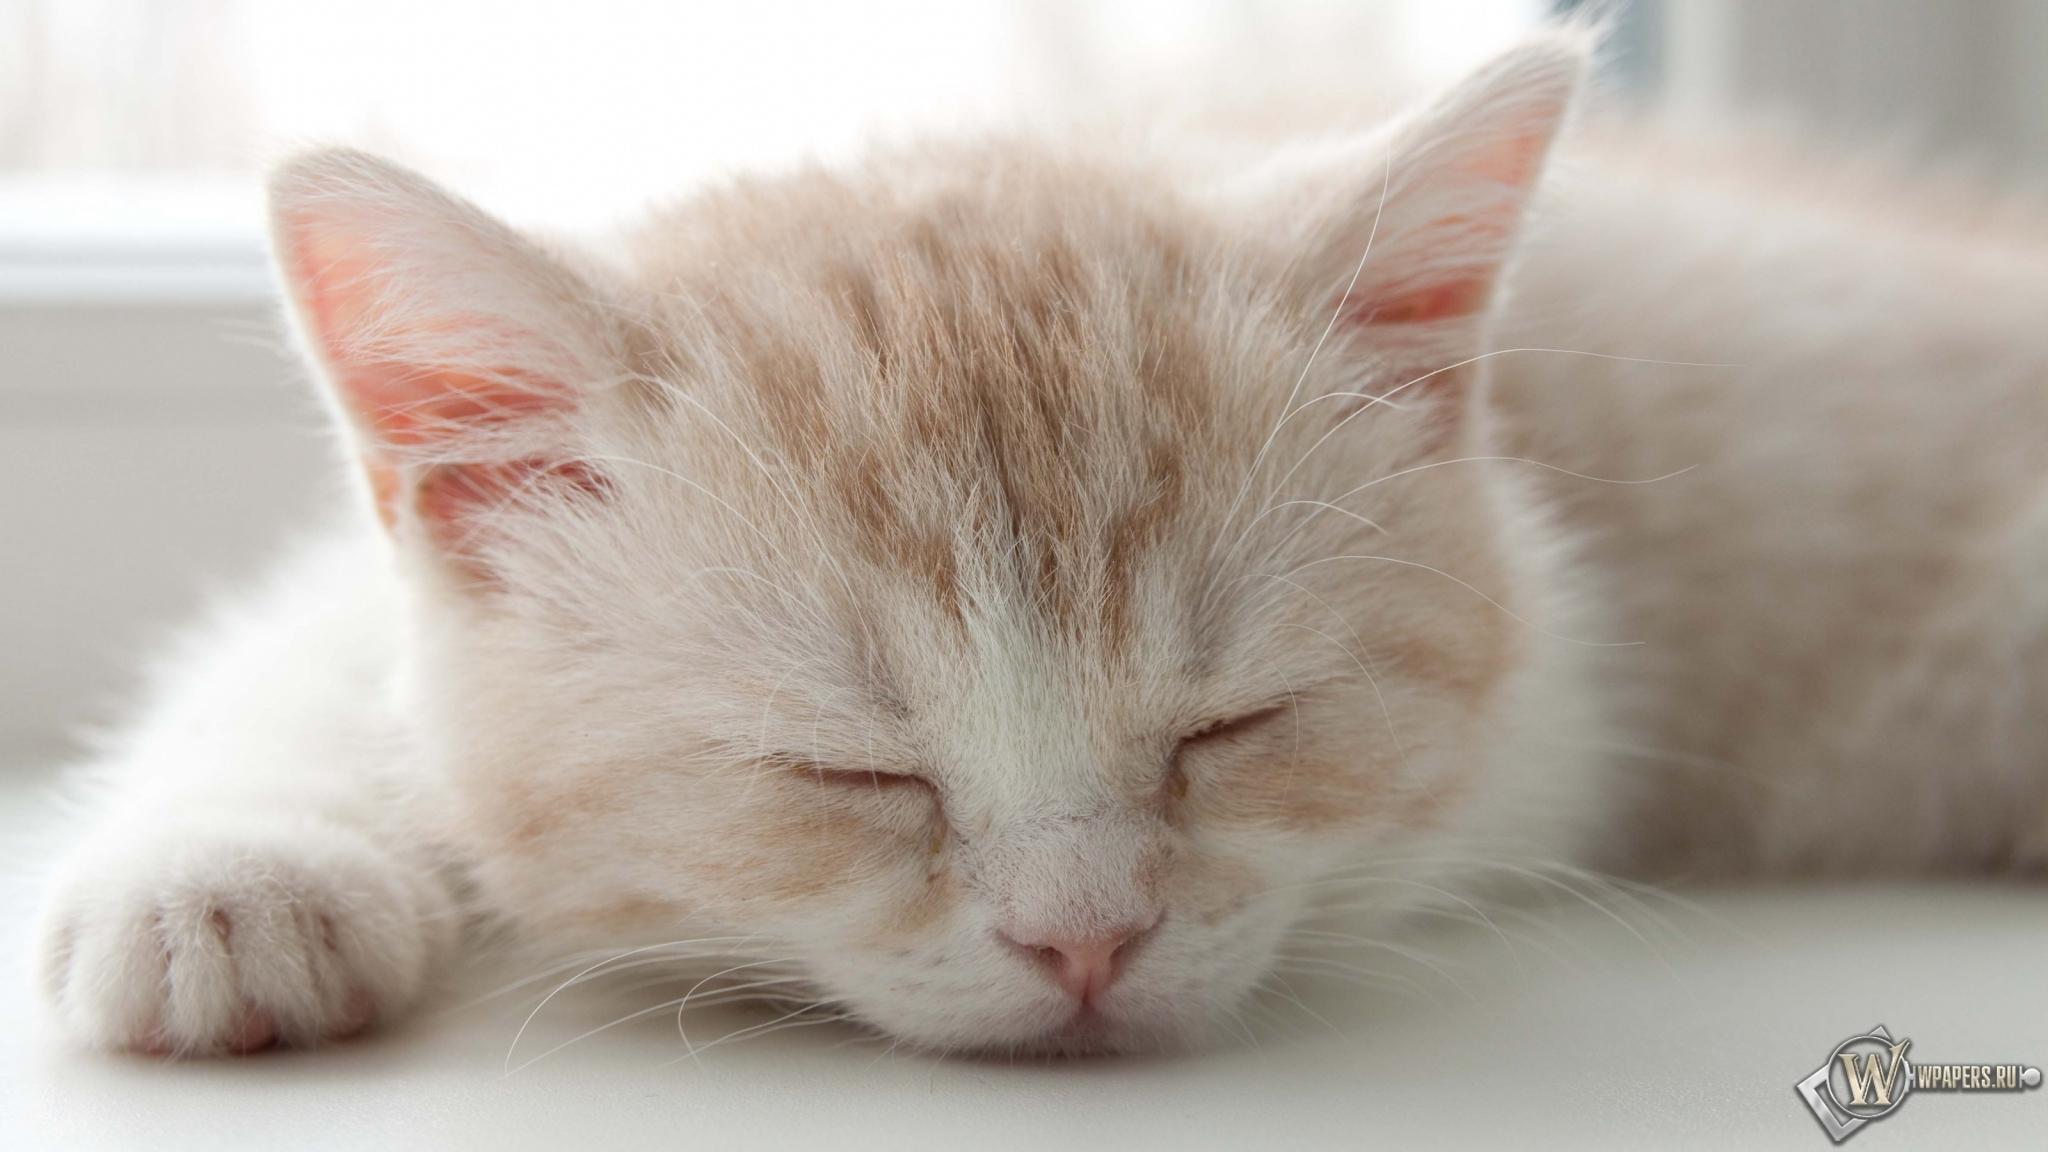 Котёнок спит 2048x1152